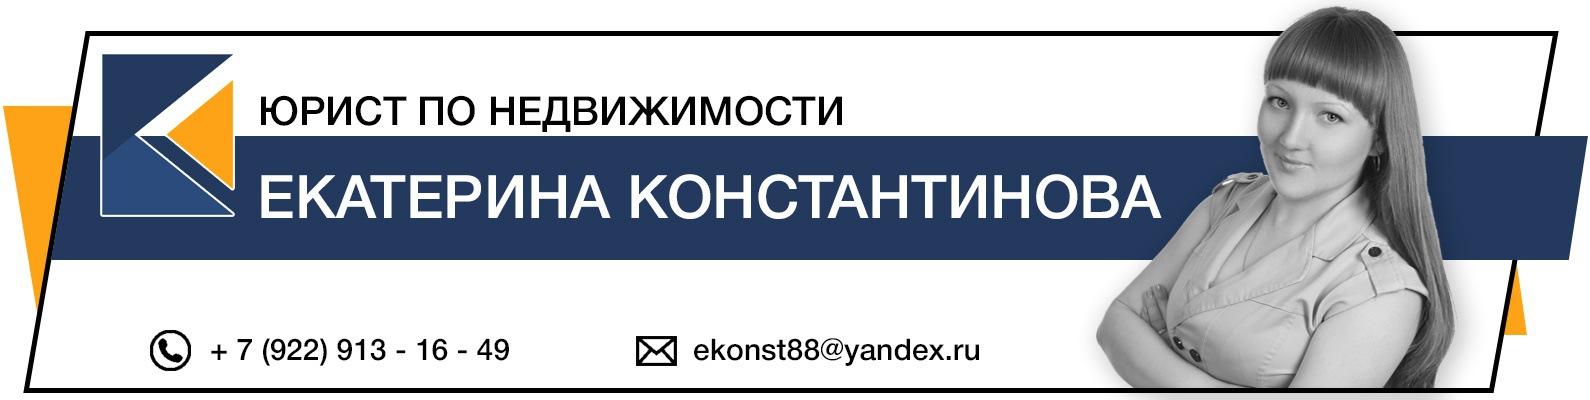 юрист кирова по недвижимости